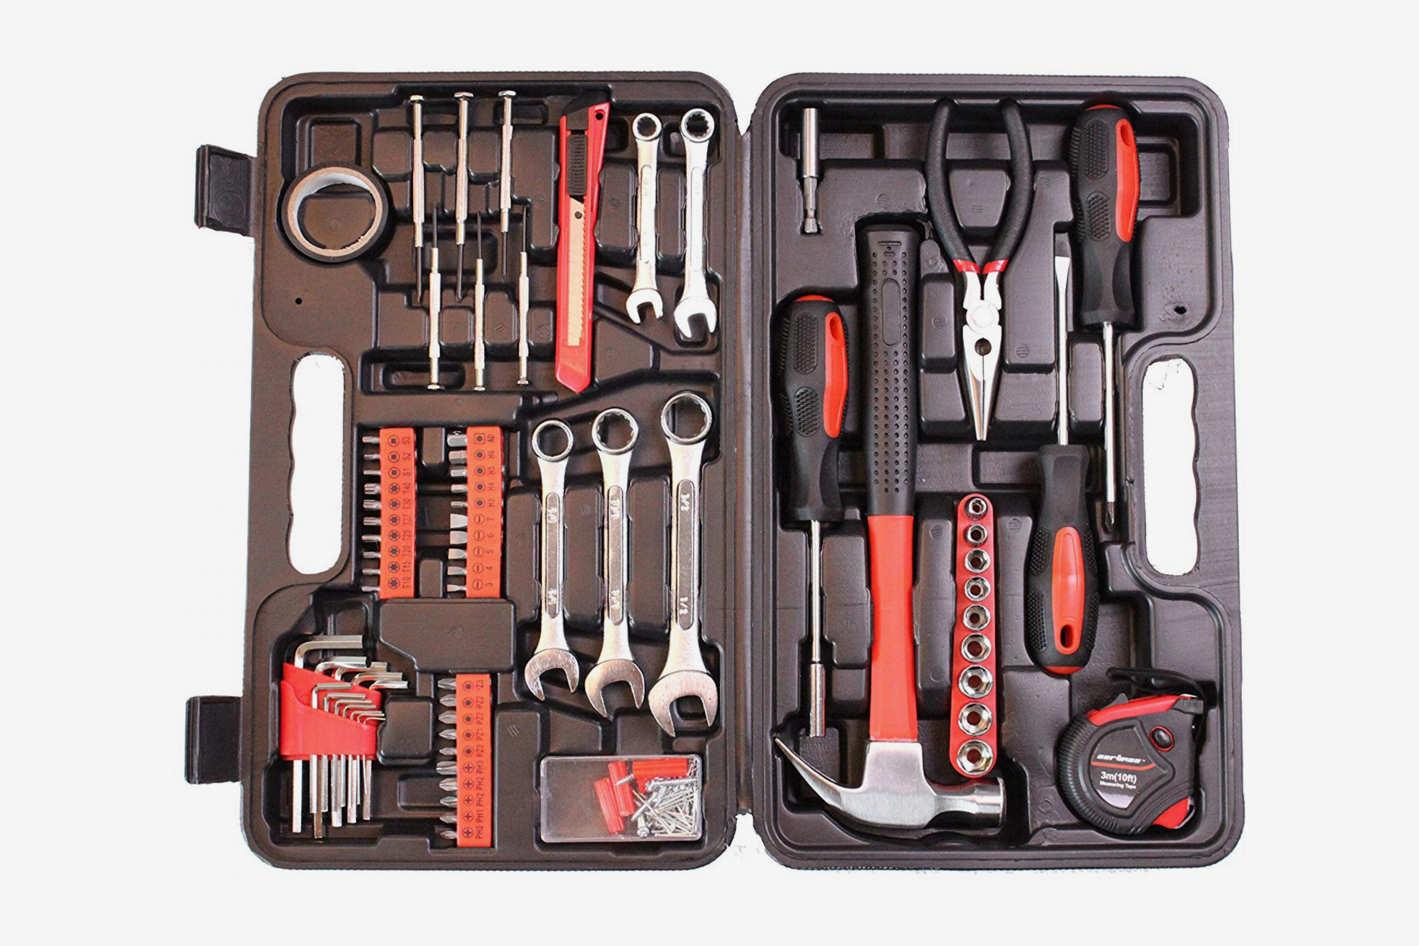 CARTMAN General Household Hand Tool Kit, 148-Piece